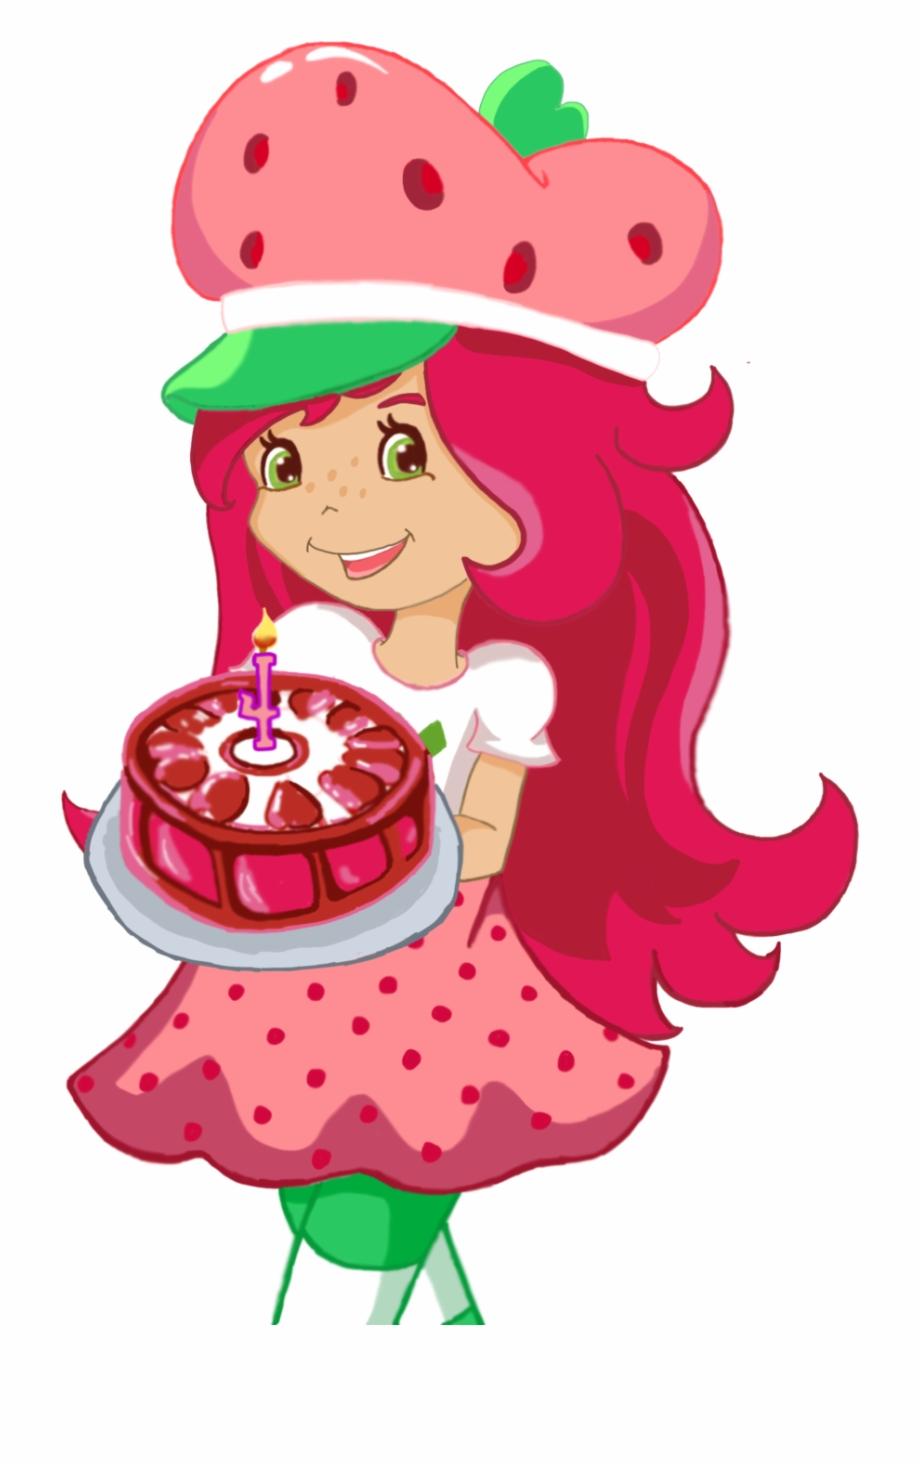 Recipes hubs clip art. Free clipart strawberry shortcake